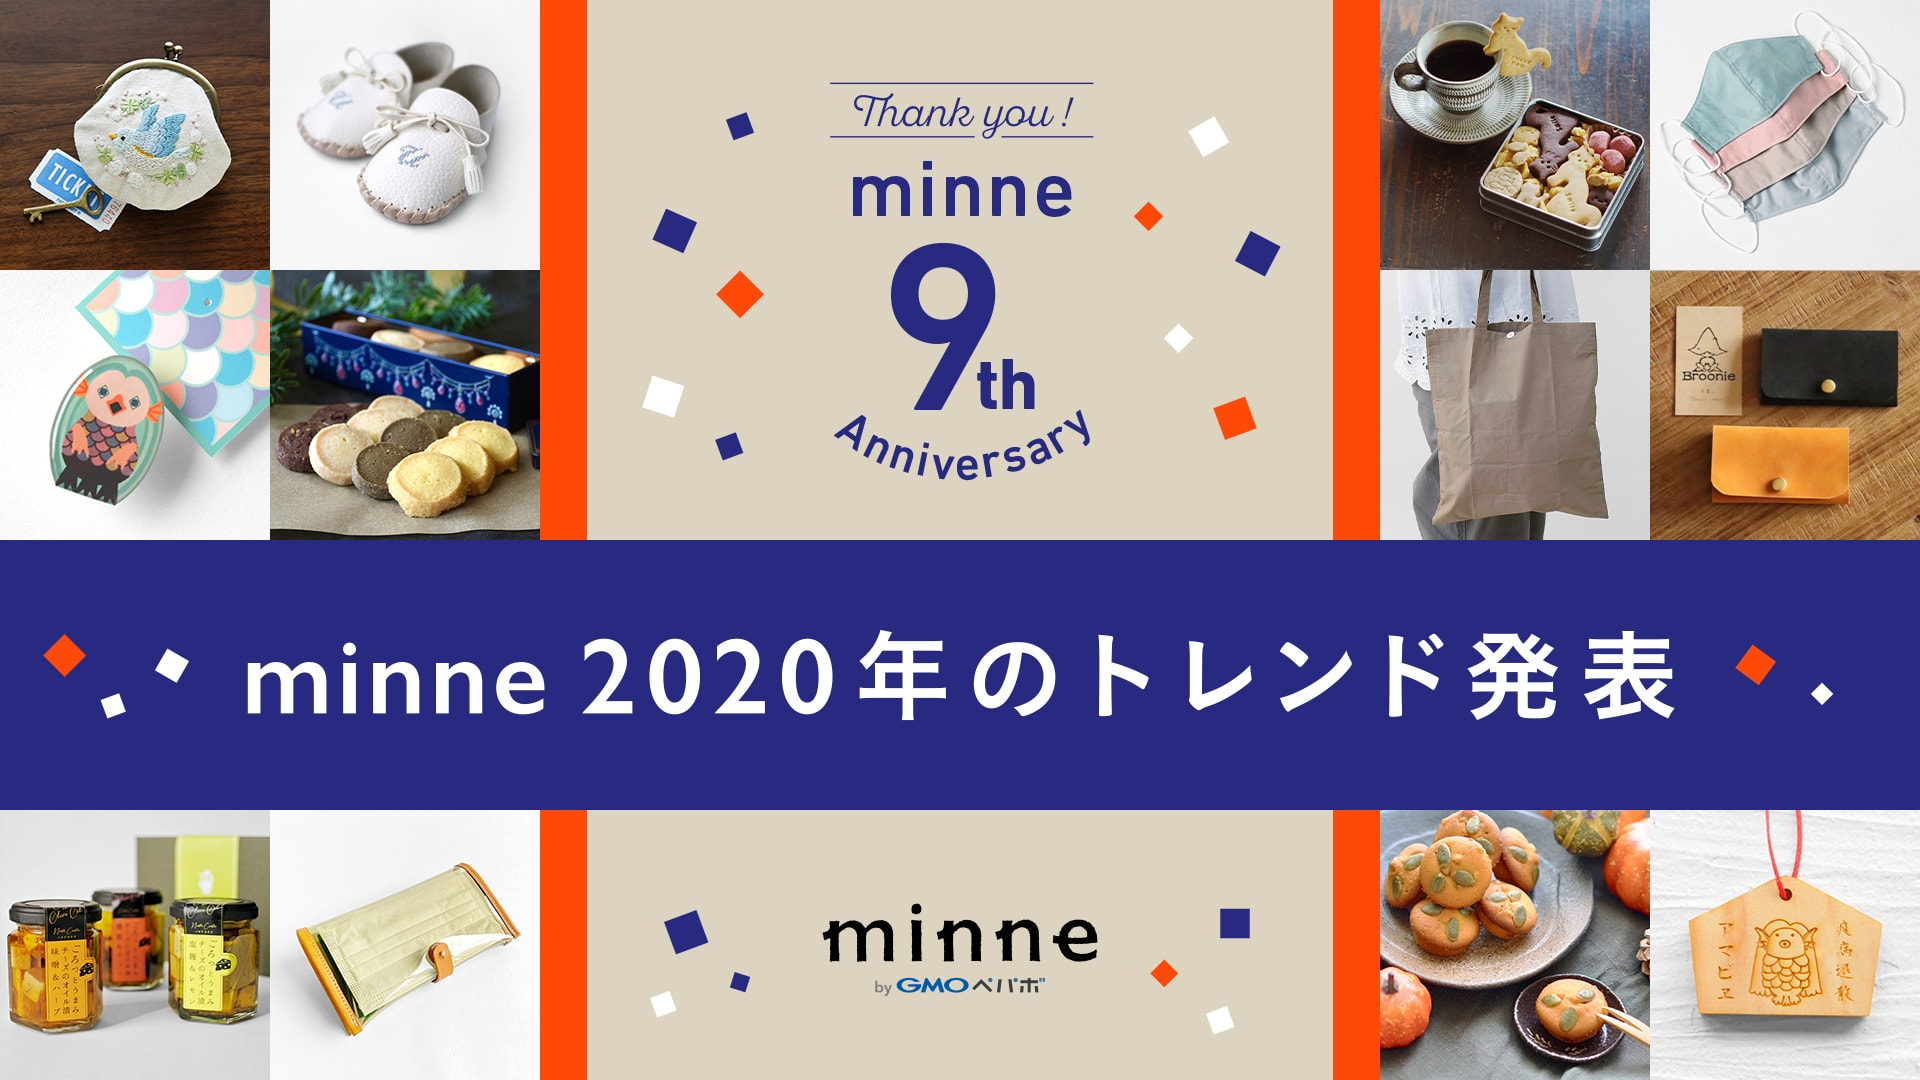 Thank you! minne 9th Anniversary / minne 2020年のトレンド発表